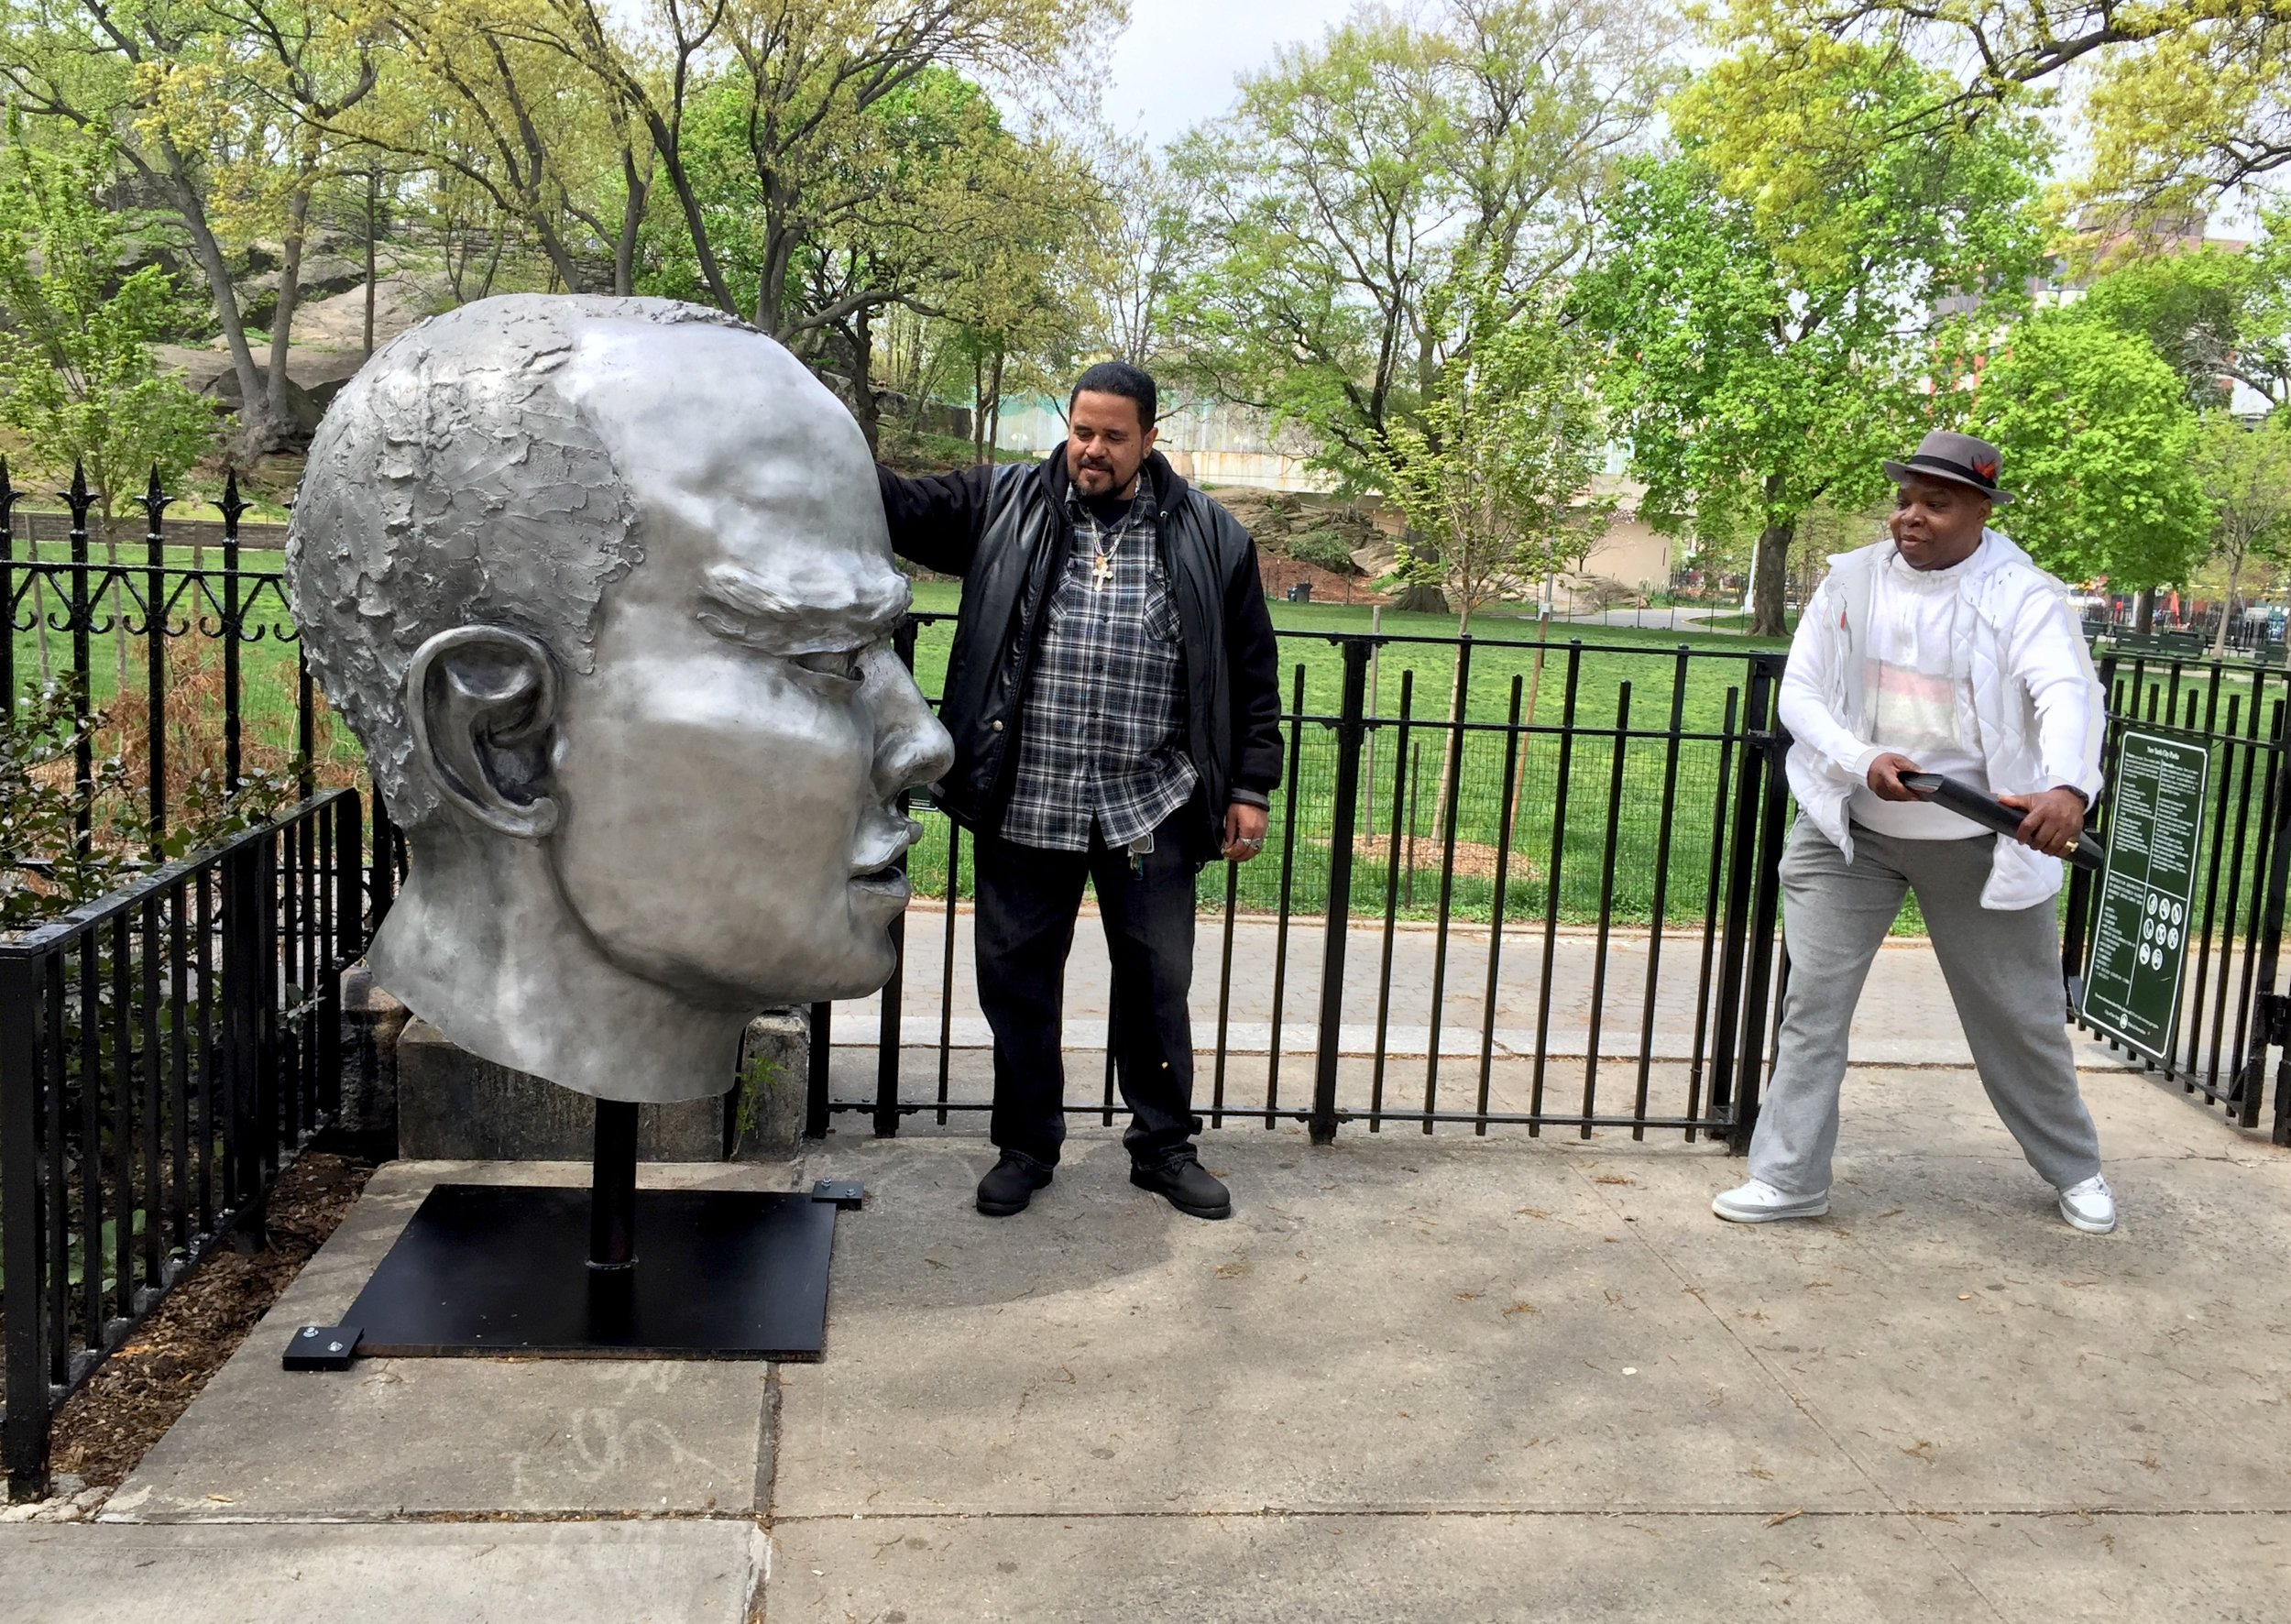 (E)Scape, Marcus Garvey Park, Harlem, NYC